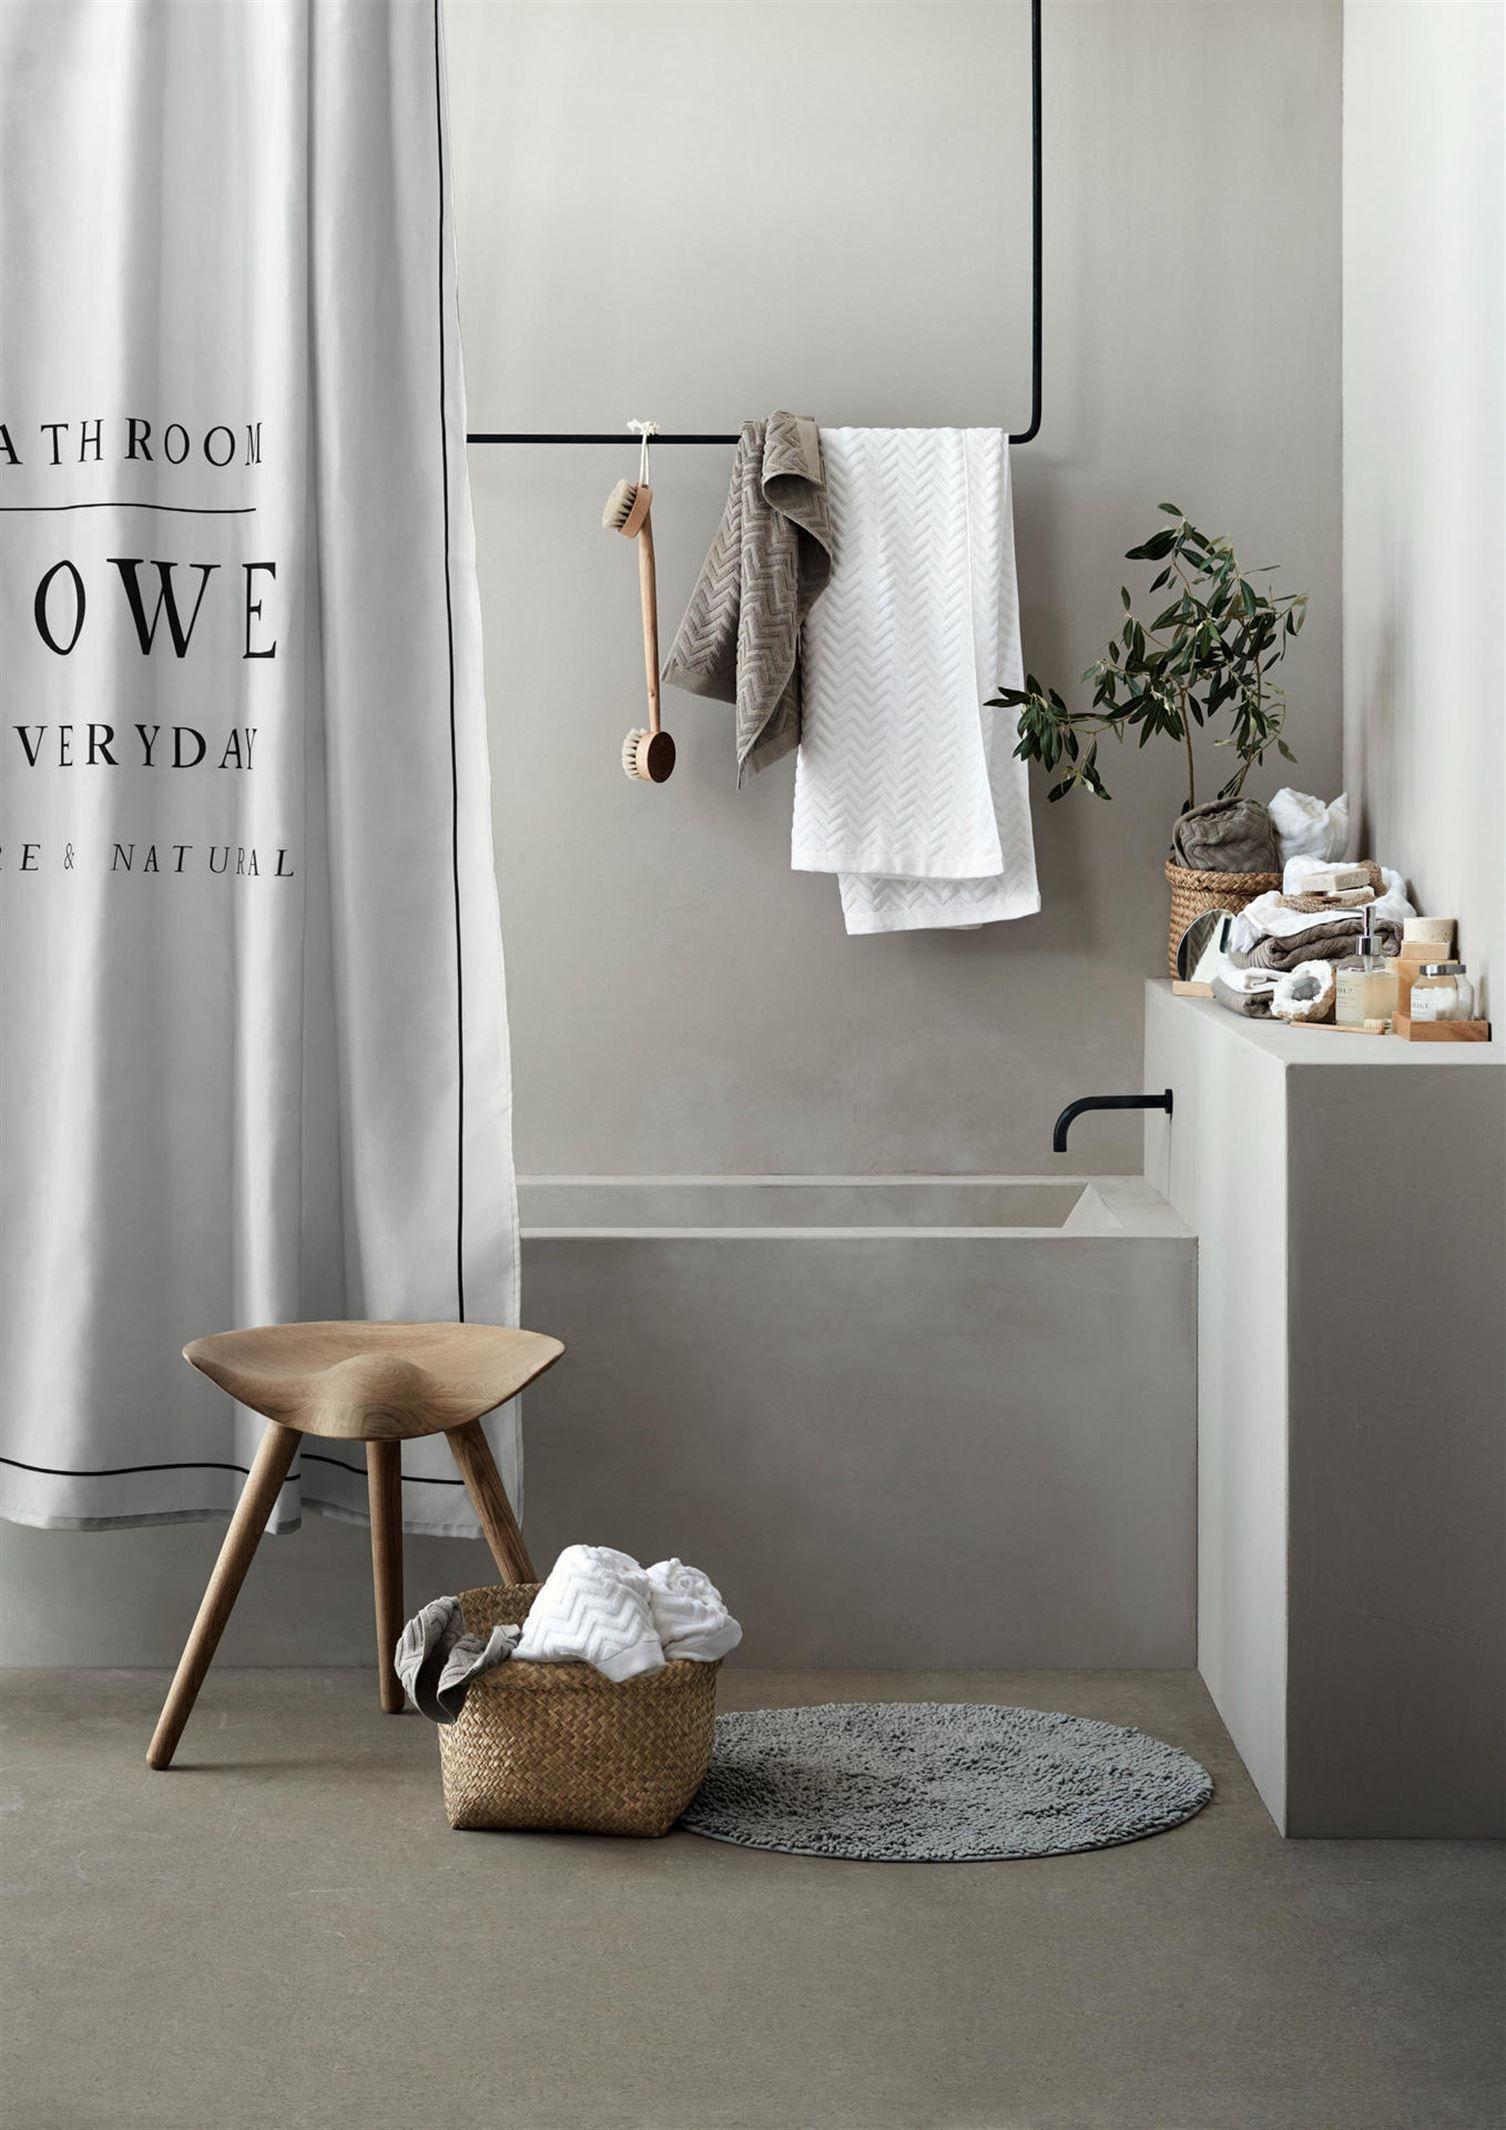 Fuite Robinet Lavabo Salle De Bain ~ Salle De Bain B Ton Bathroom Salle De Bain Pinterest Bath